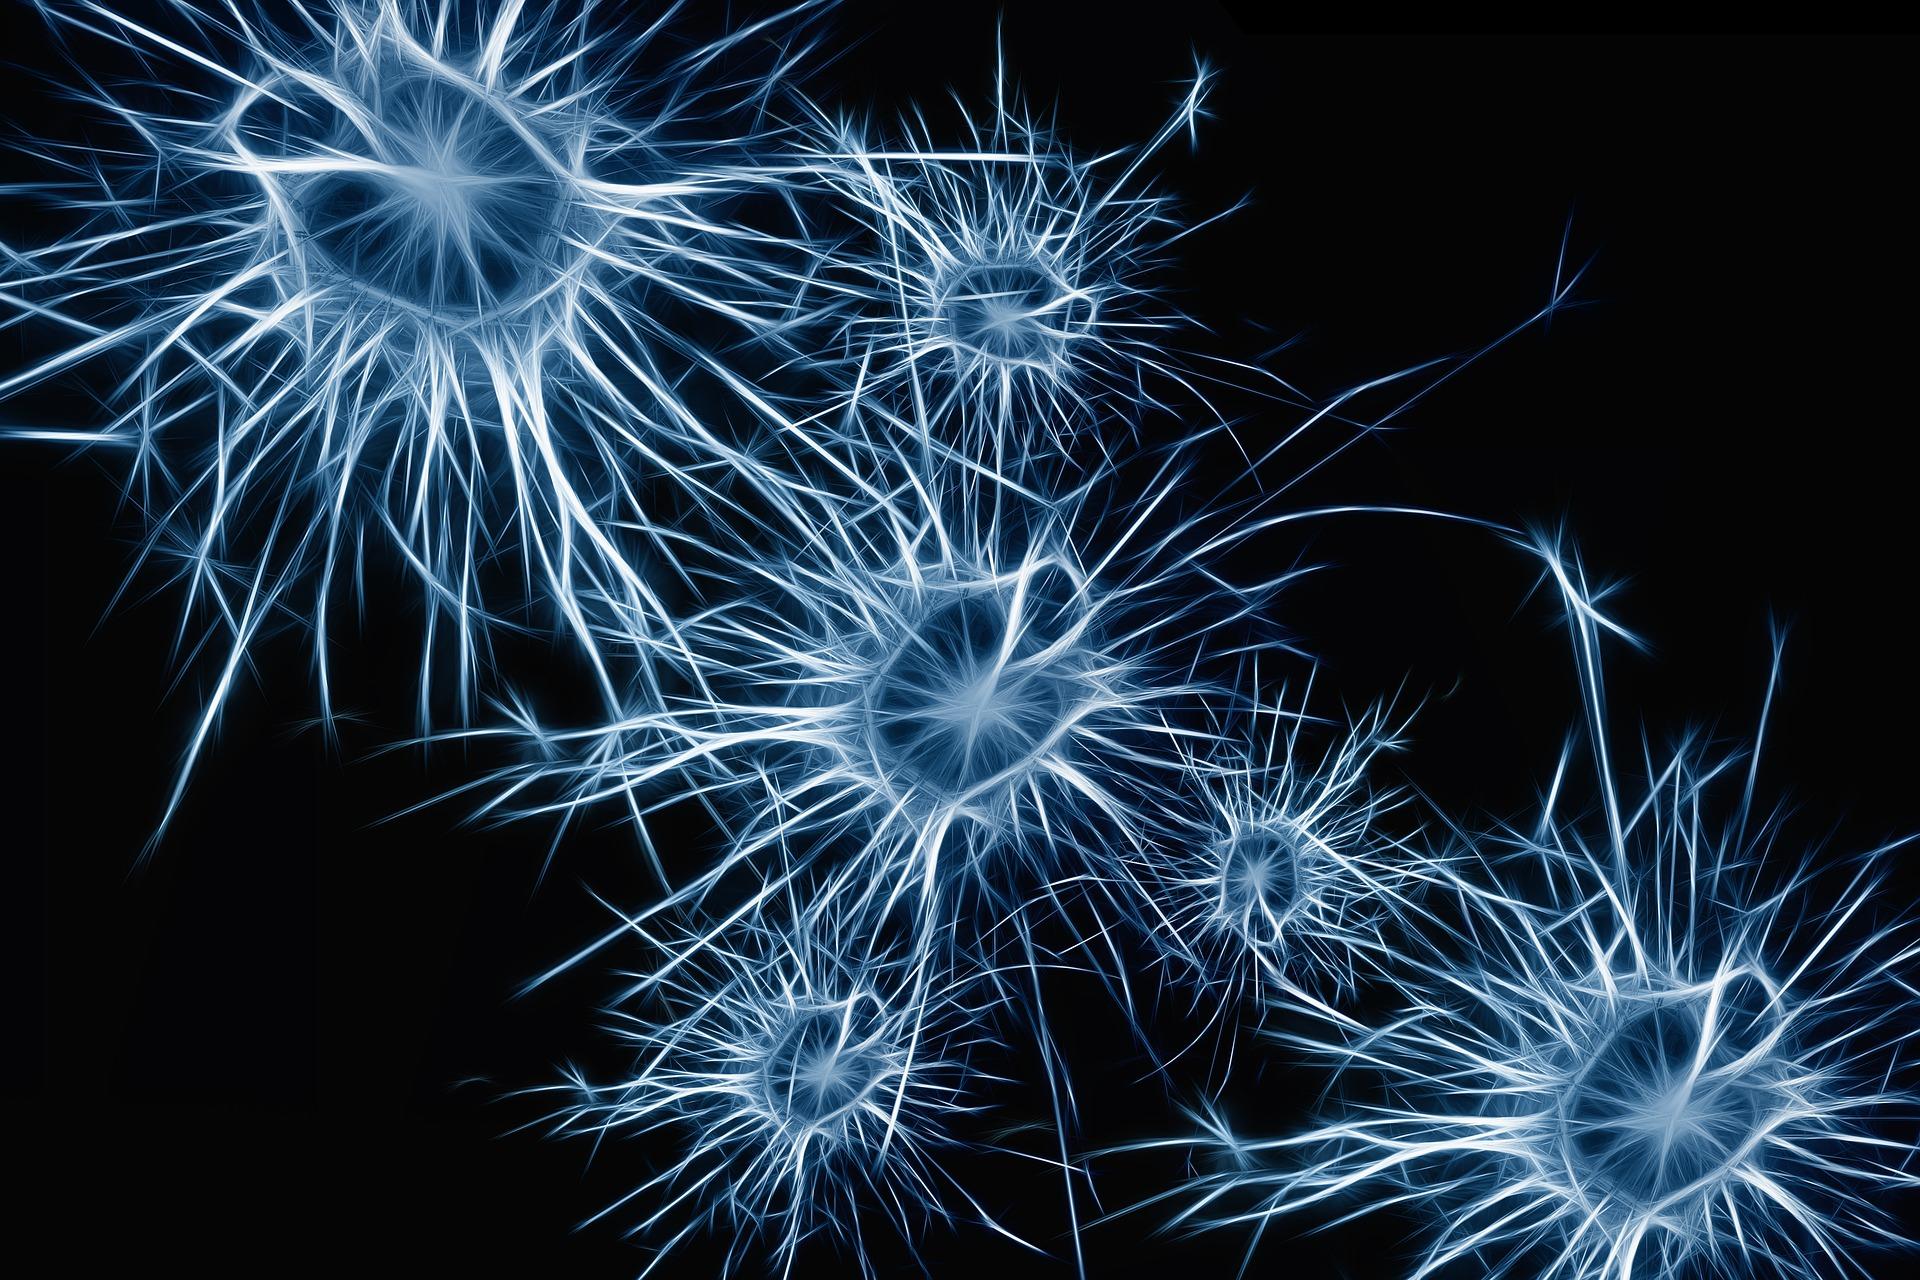 neurons-1773922_1920.jpg